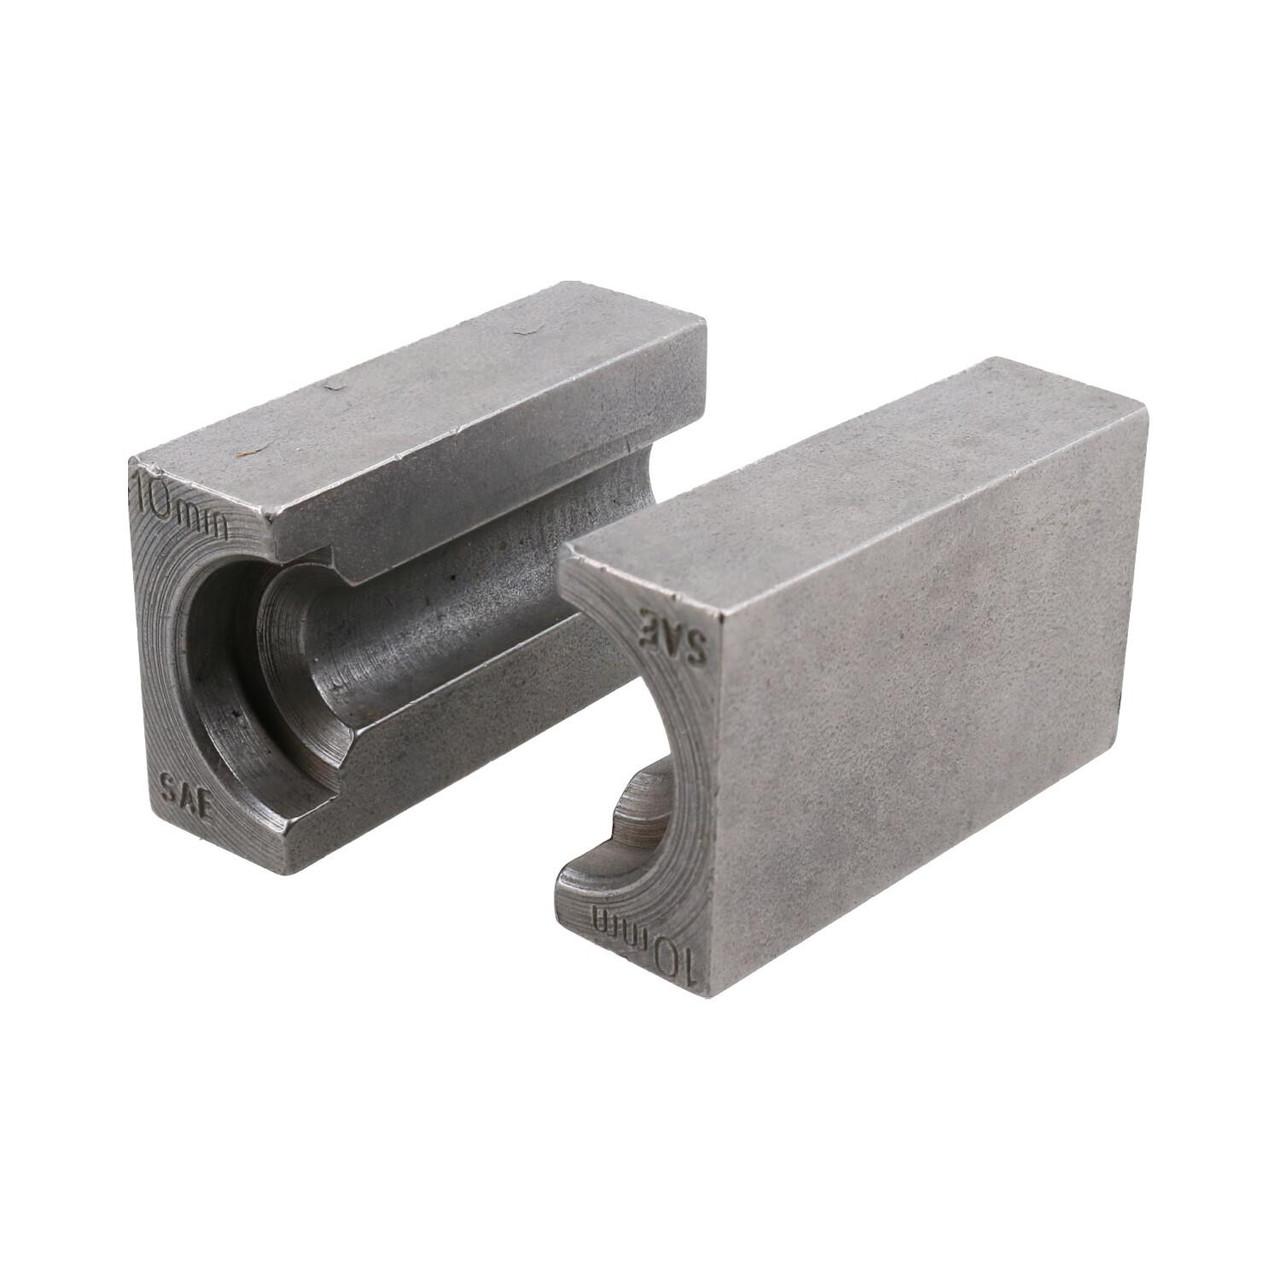 10mm SAE Brake Pipe Flaring Flare Tool Split Die Clamp FL41